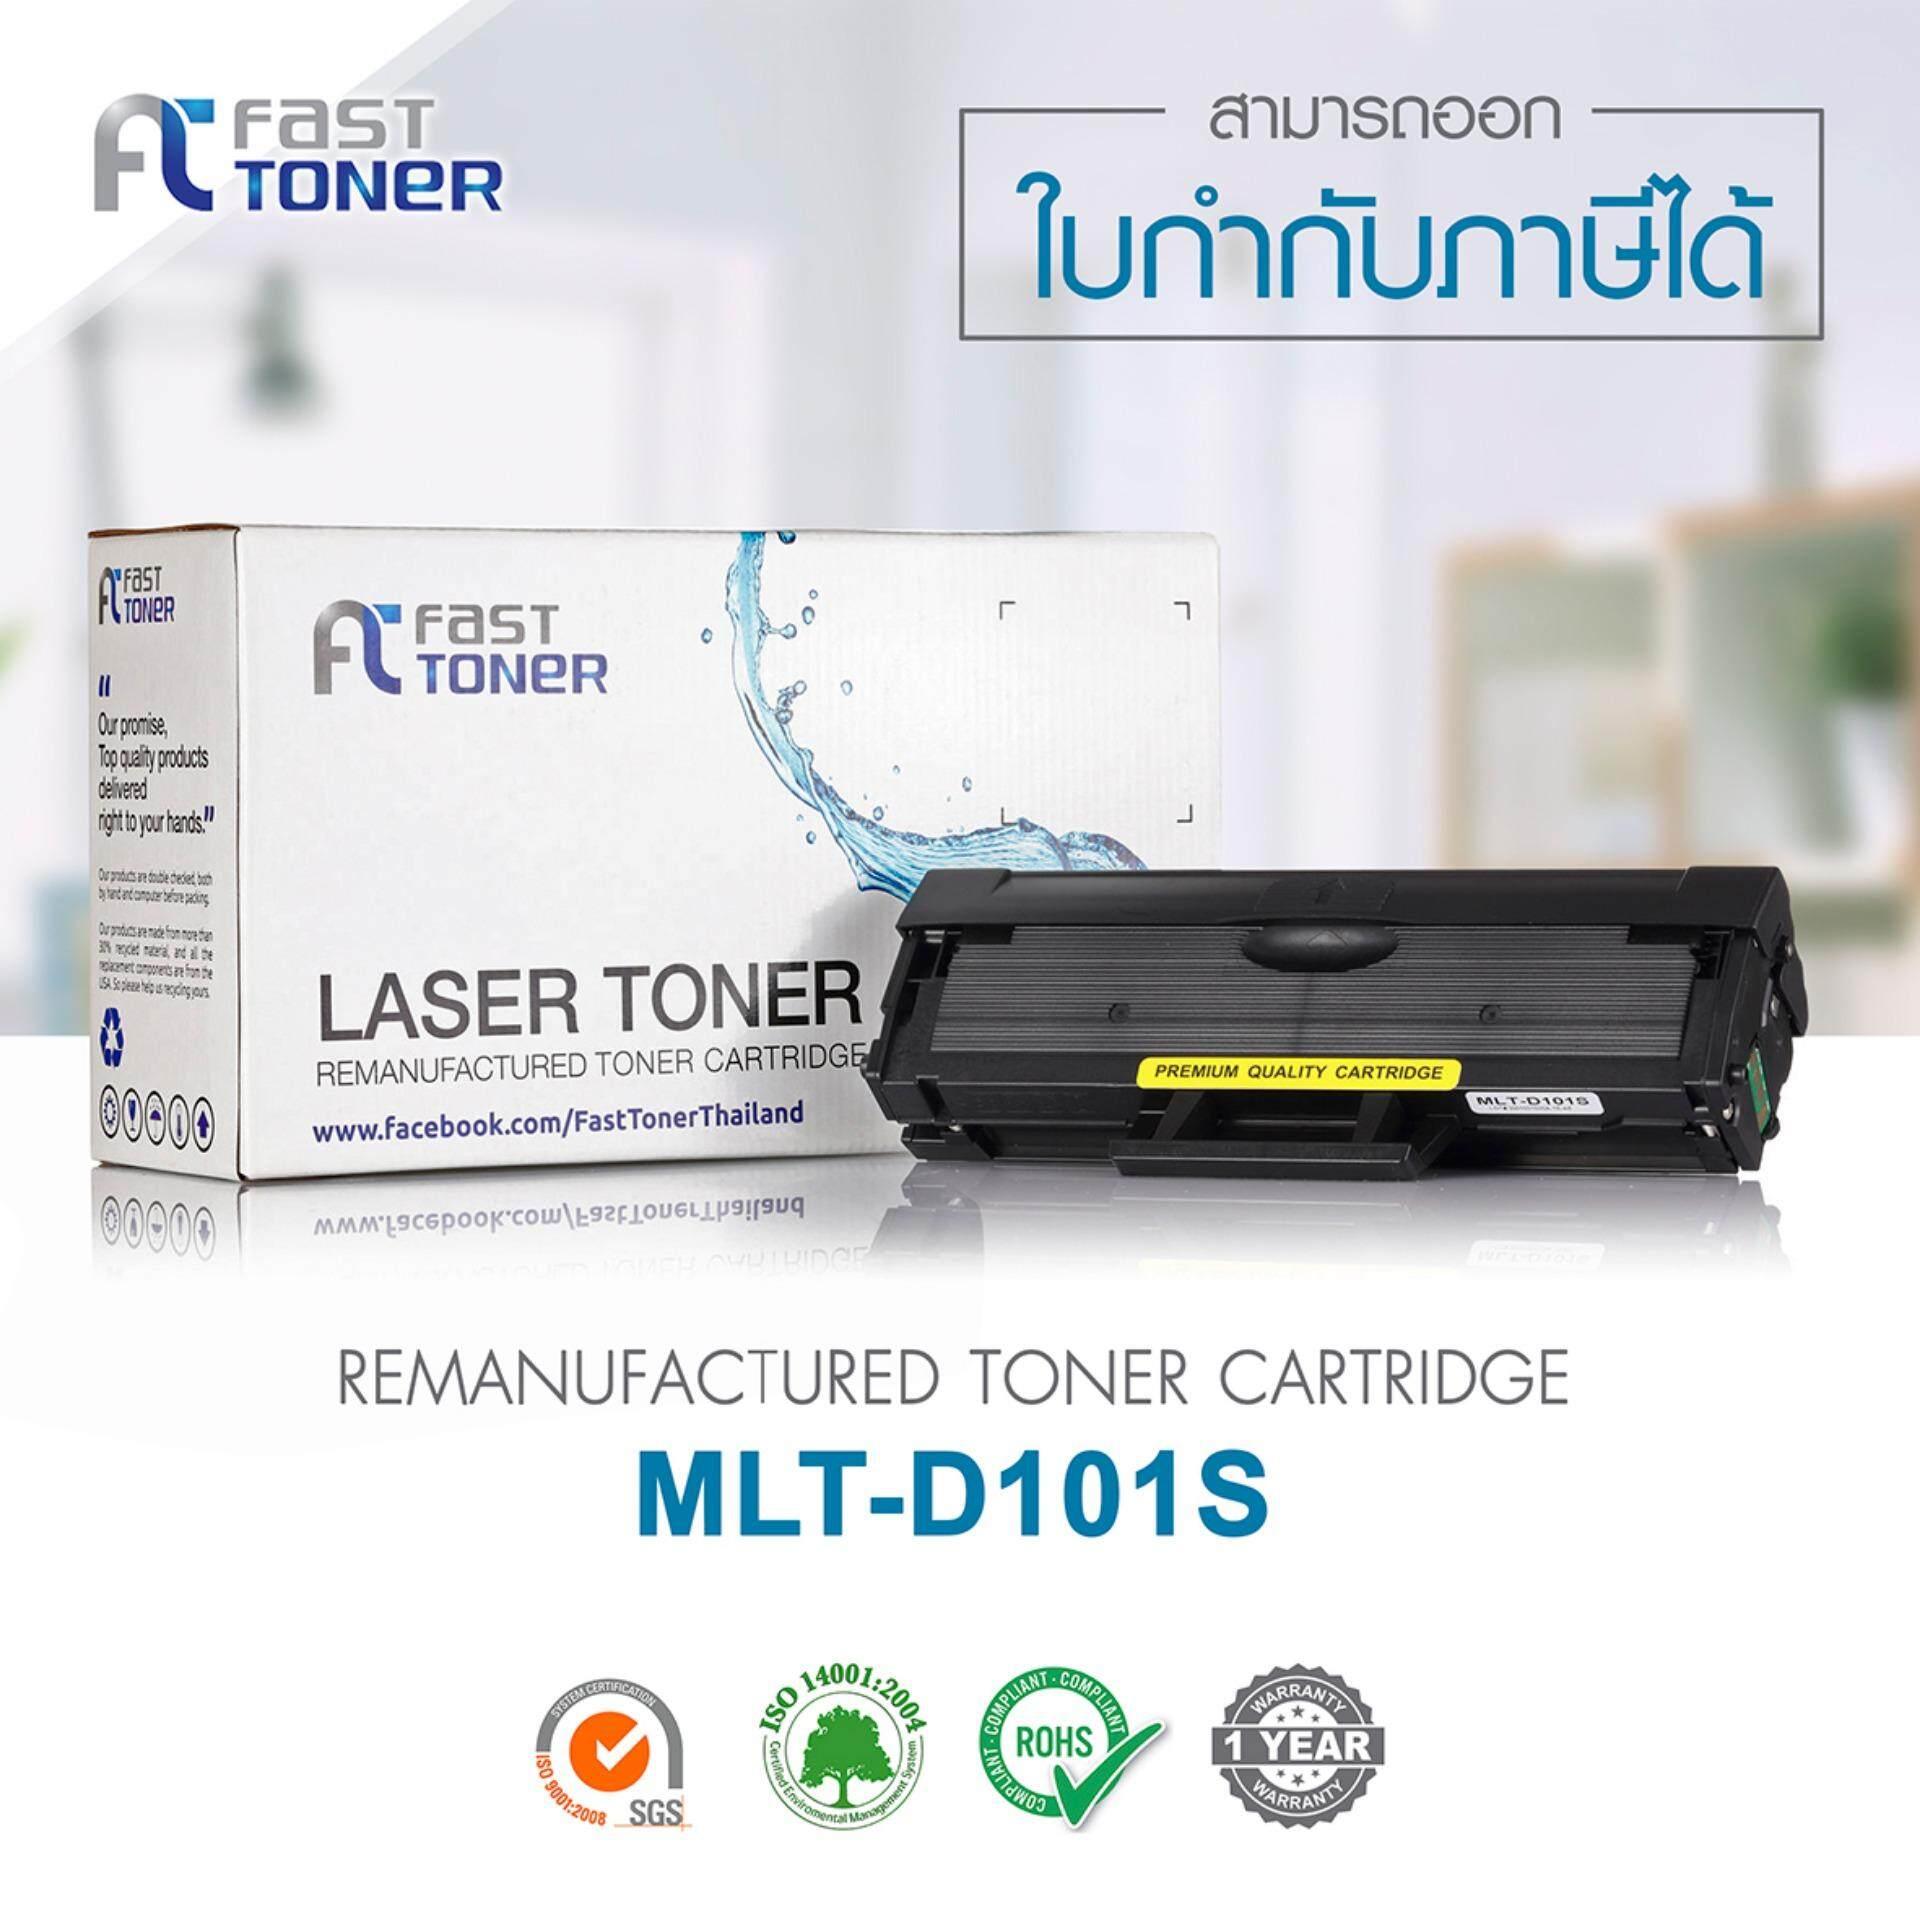 Fast tonerตลับหมึกเทียบเท่าSamsung ML-2160/ ML-2165/ ML-2160W/ ML-2165W/ ML-2168W (Samsung MLT-D101S) (BK)